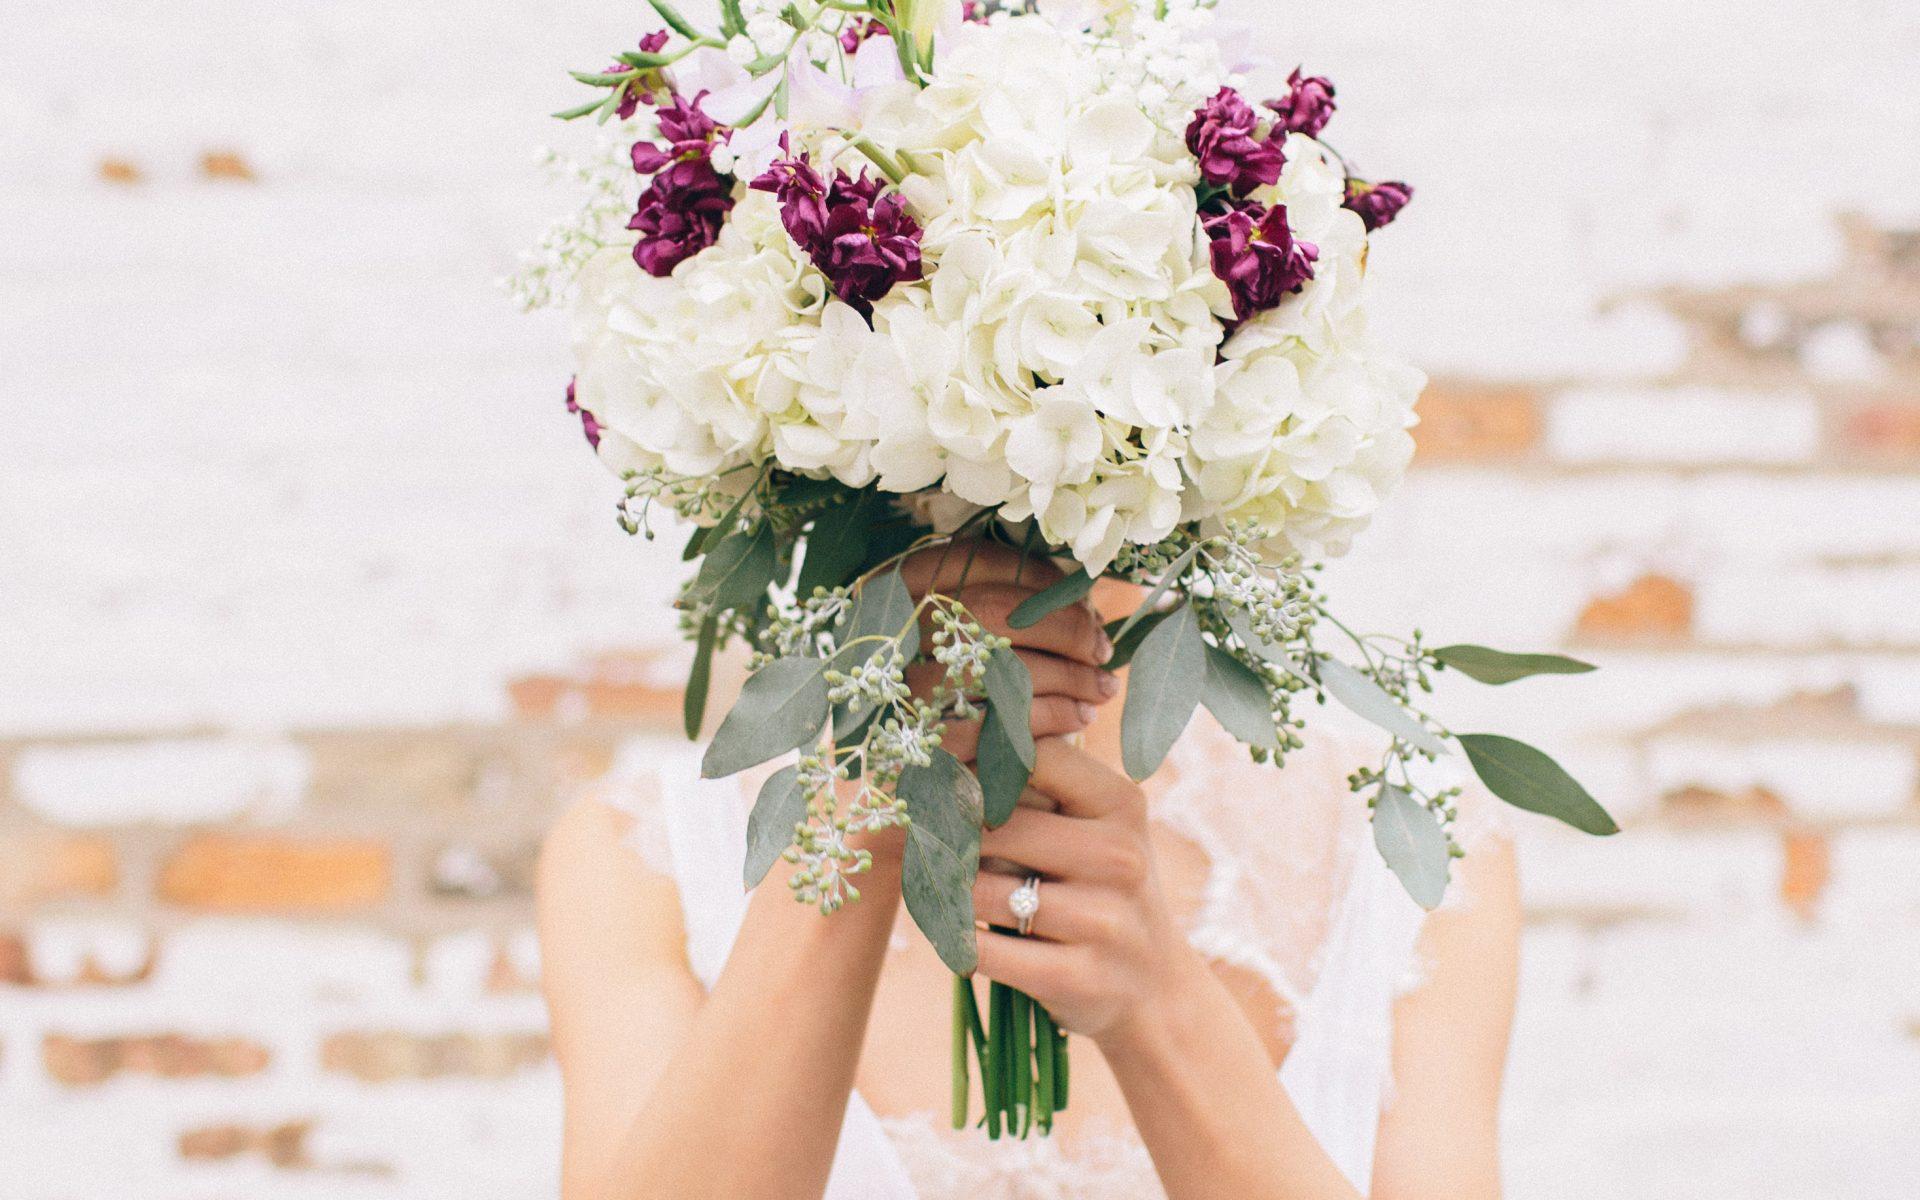 Matrimonio Fai da te